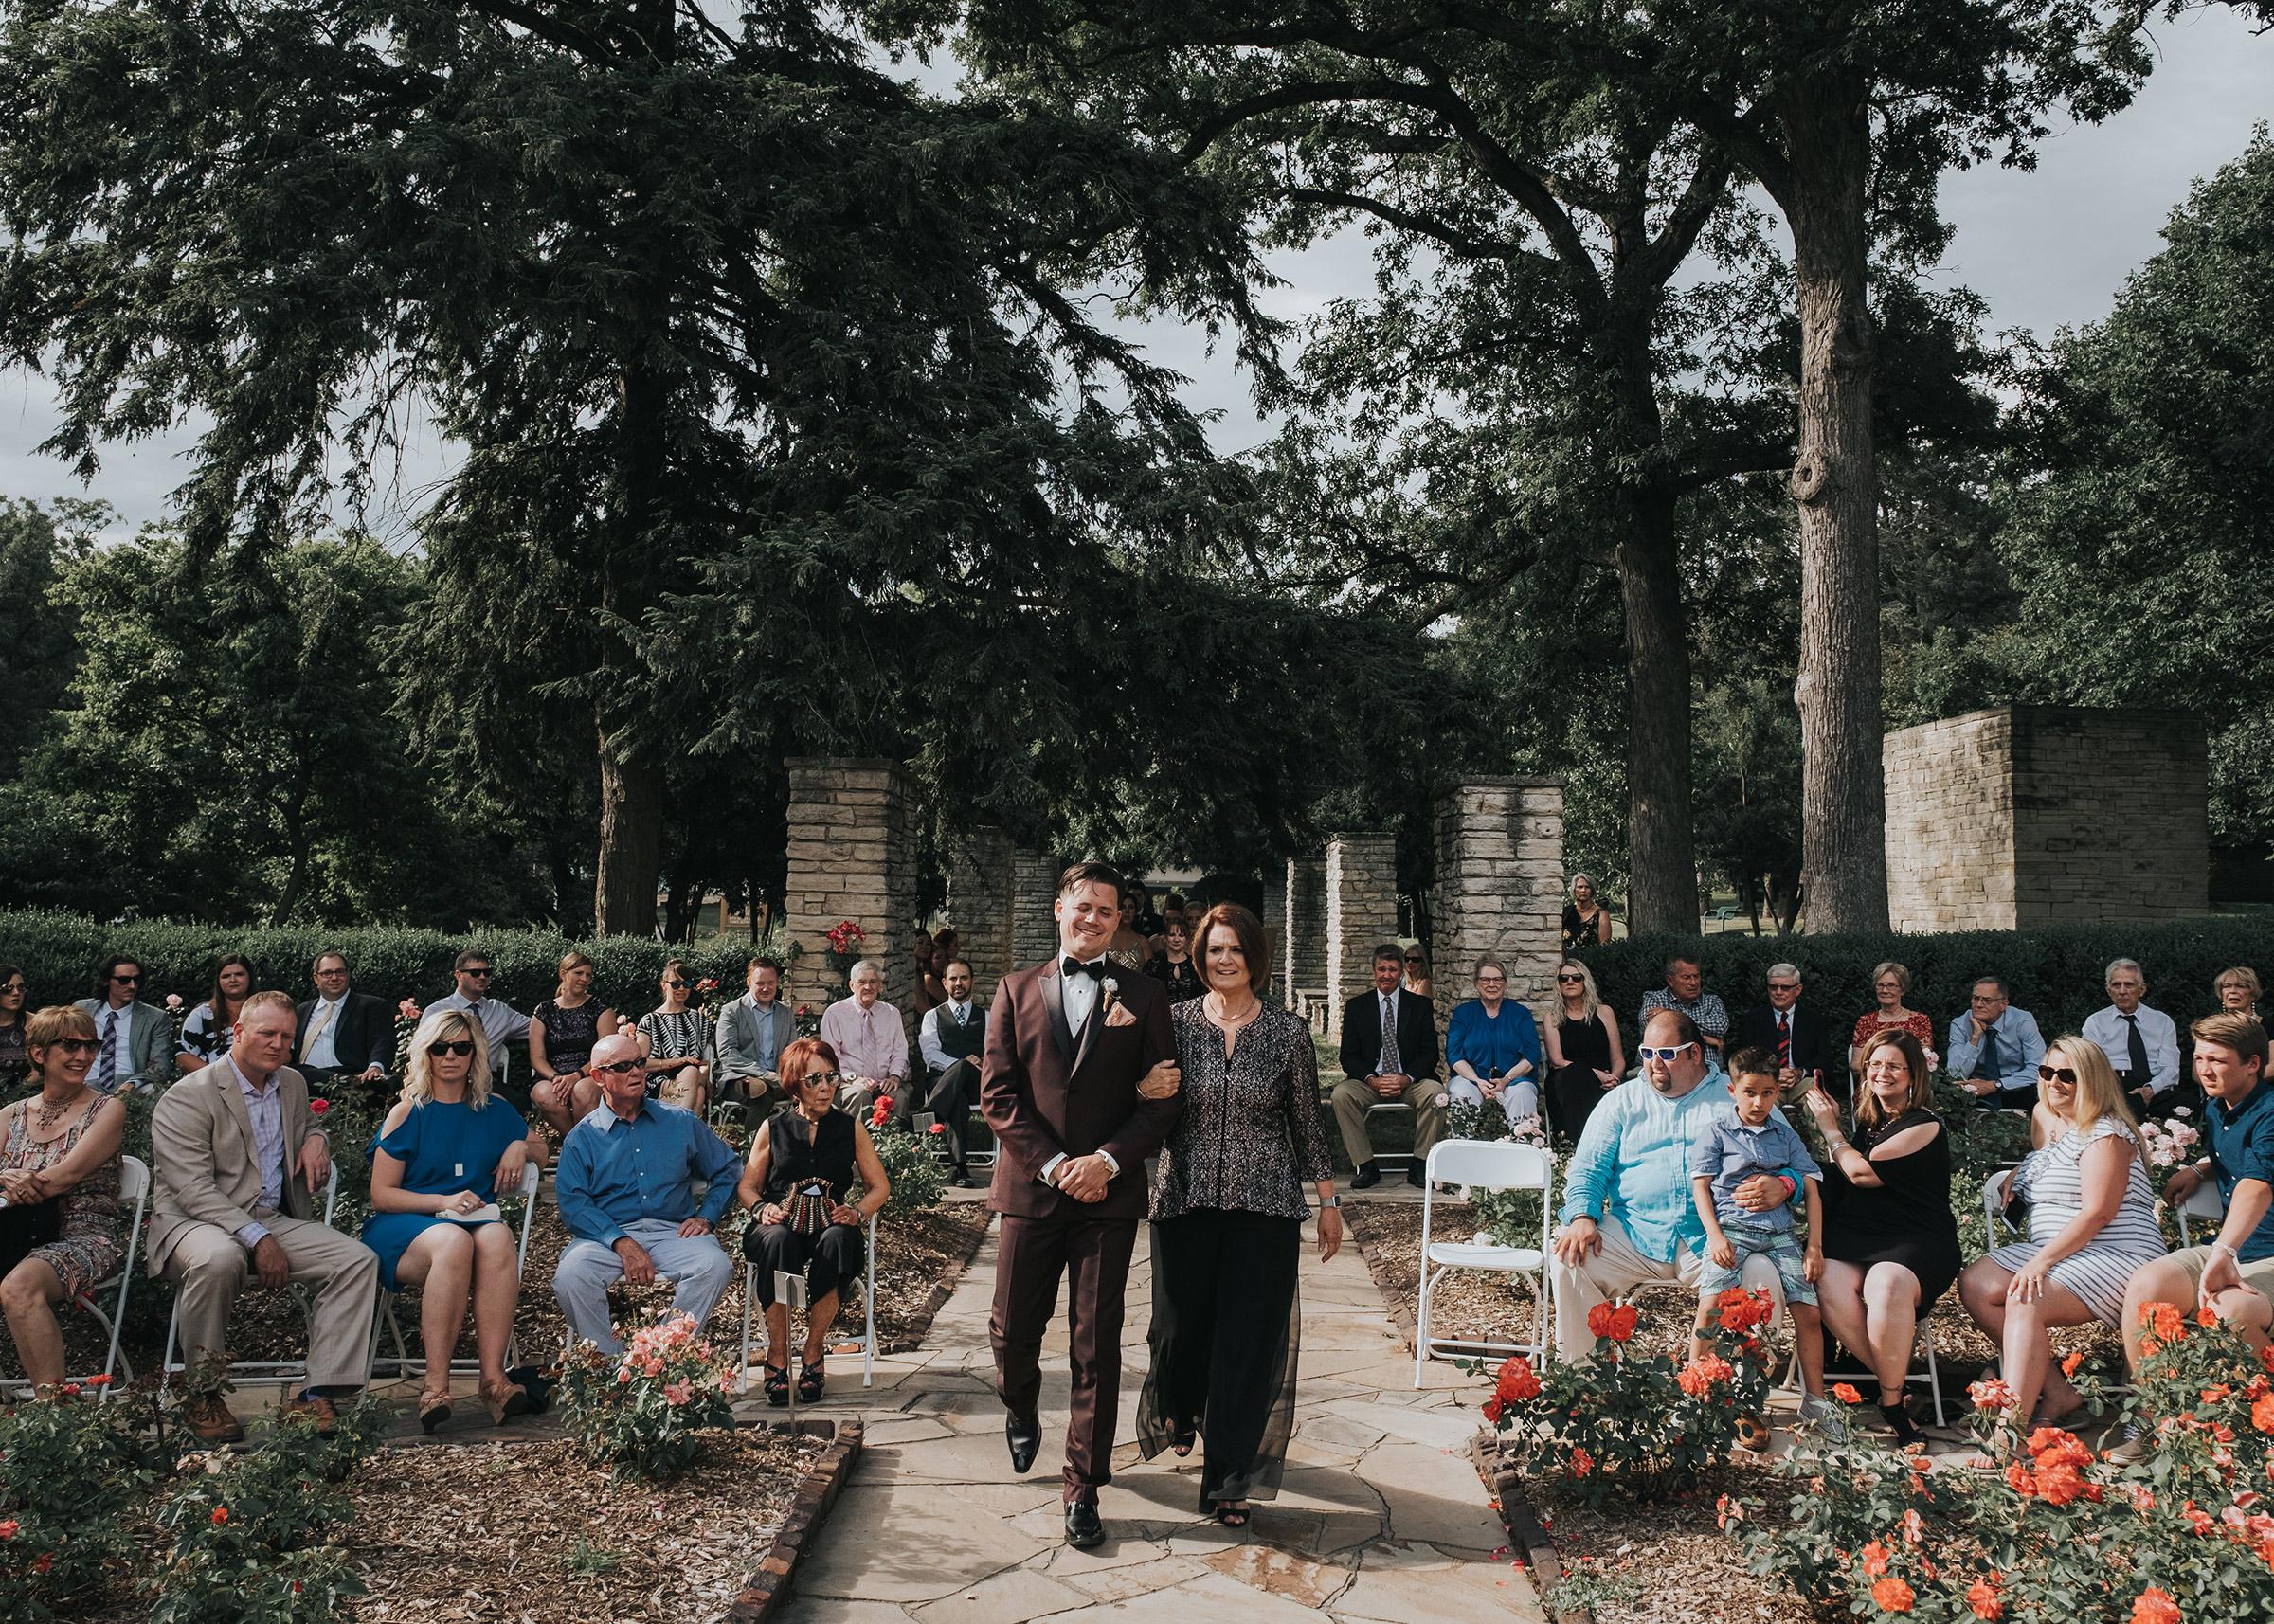 groom-walking-mother-down-aisle-desmoines-iowa-rose-garden-raelyn-ramey-photography.jpg